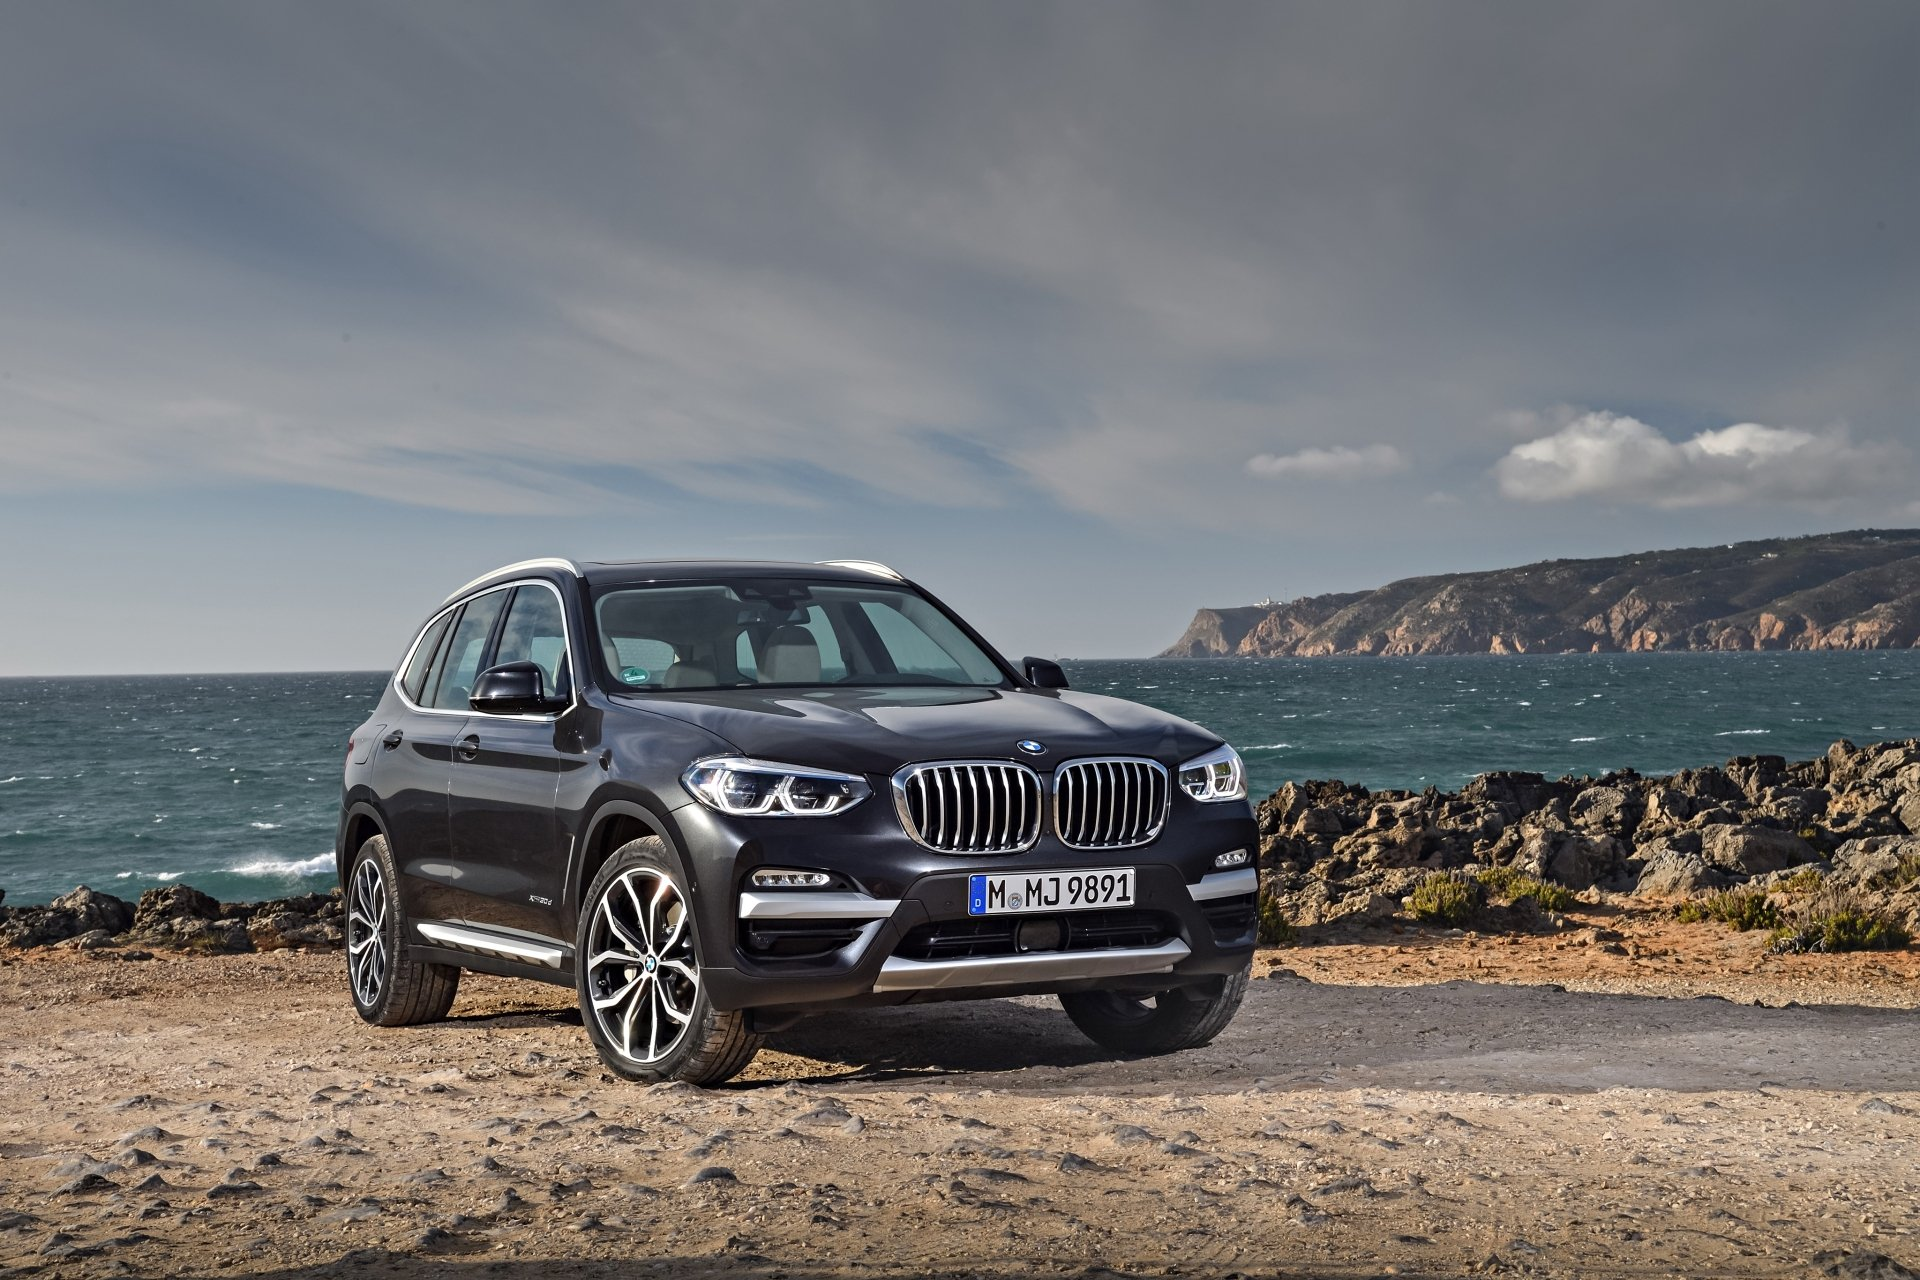 BMW X3 4k Ultra HD Wallpaper | Background Image ...